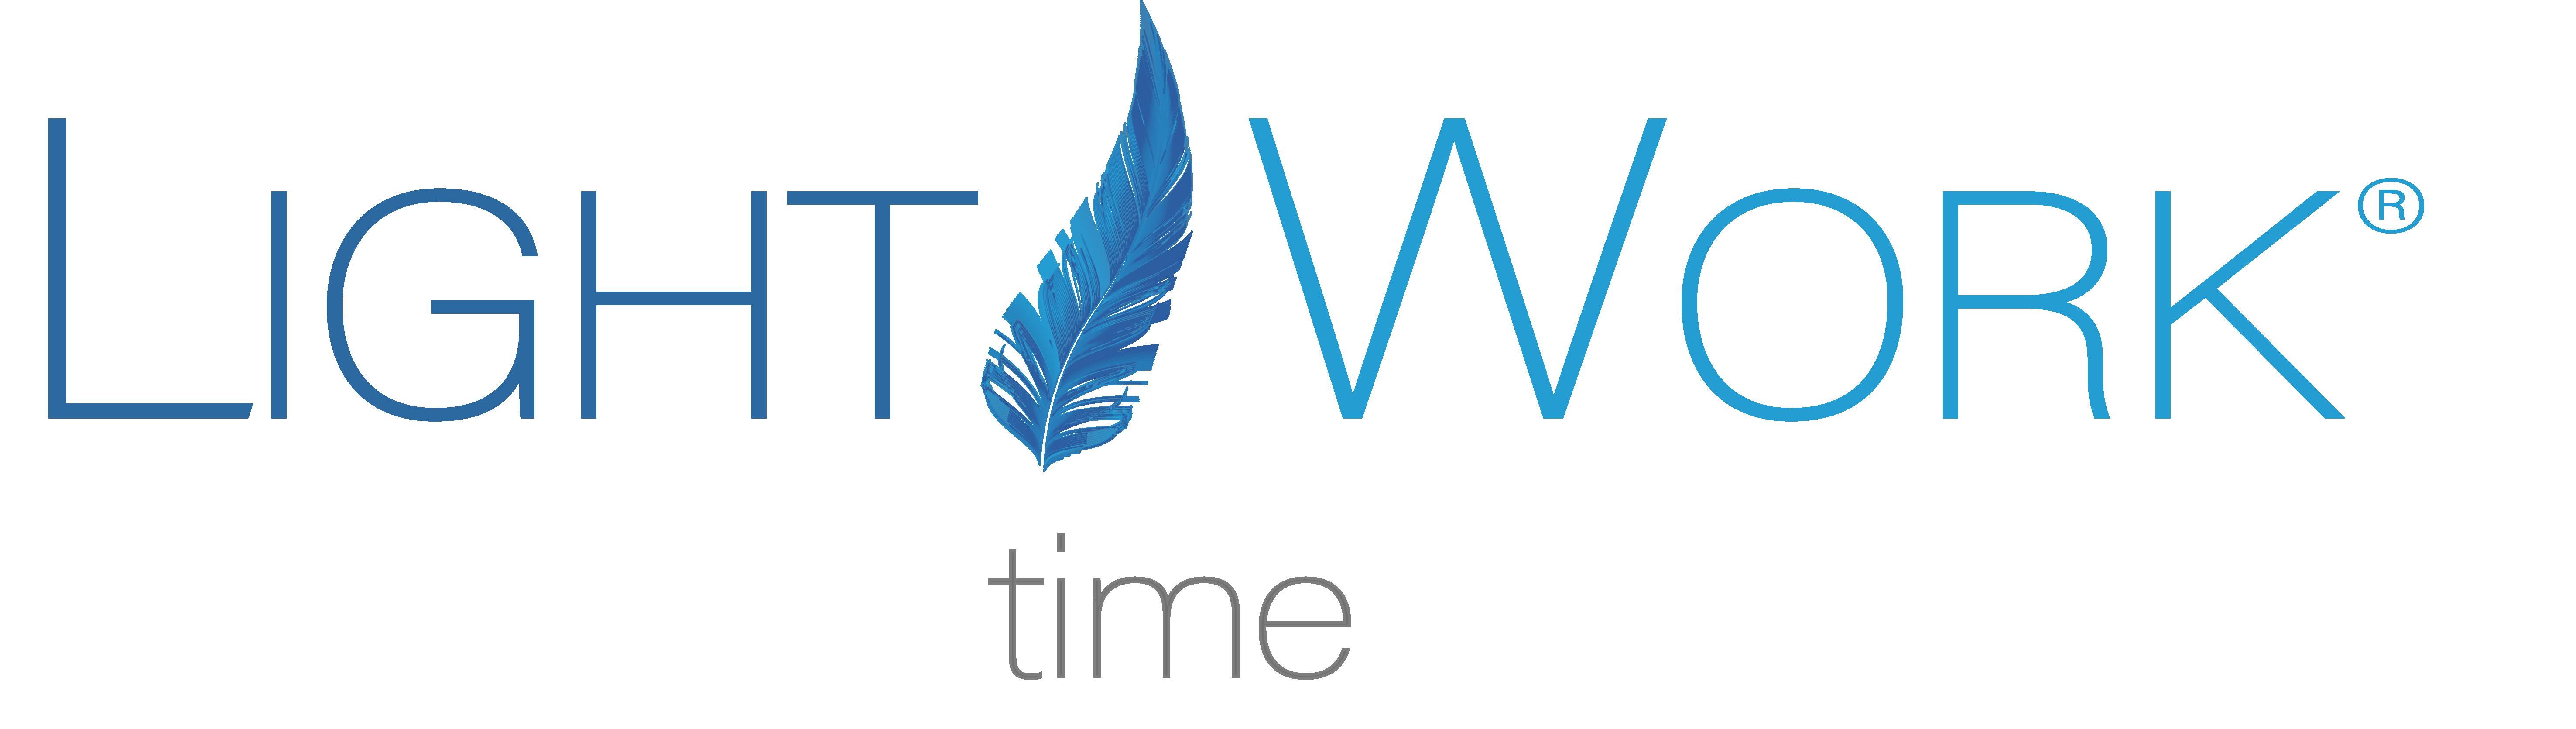 LightWork Time logo